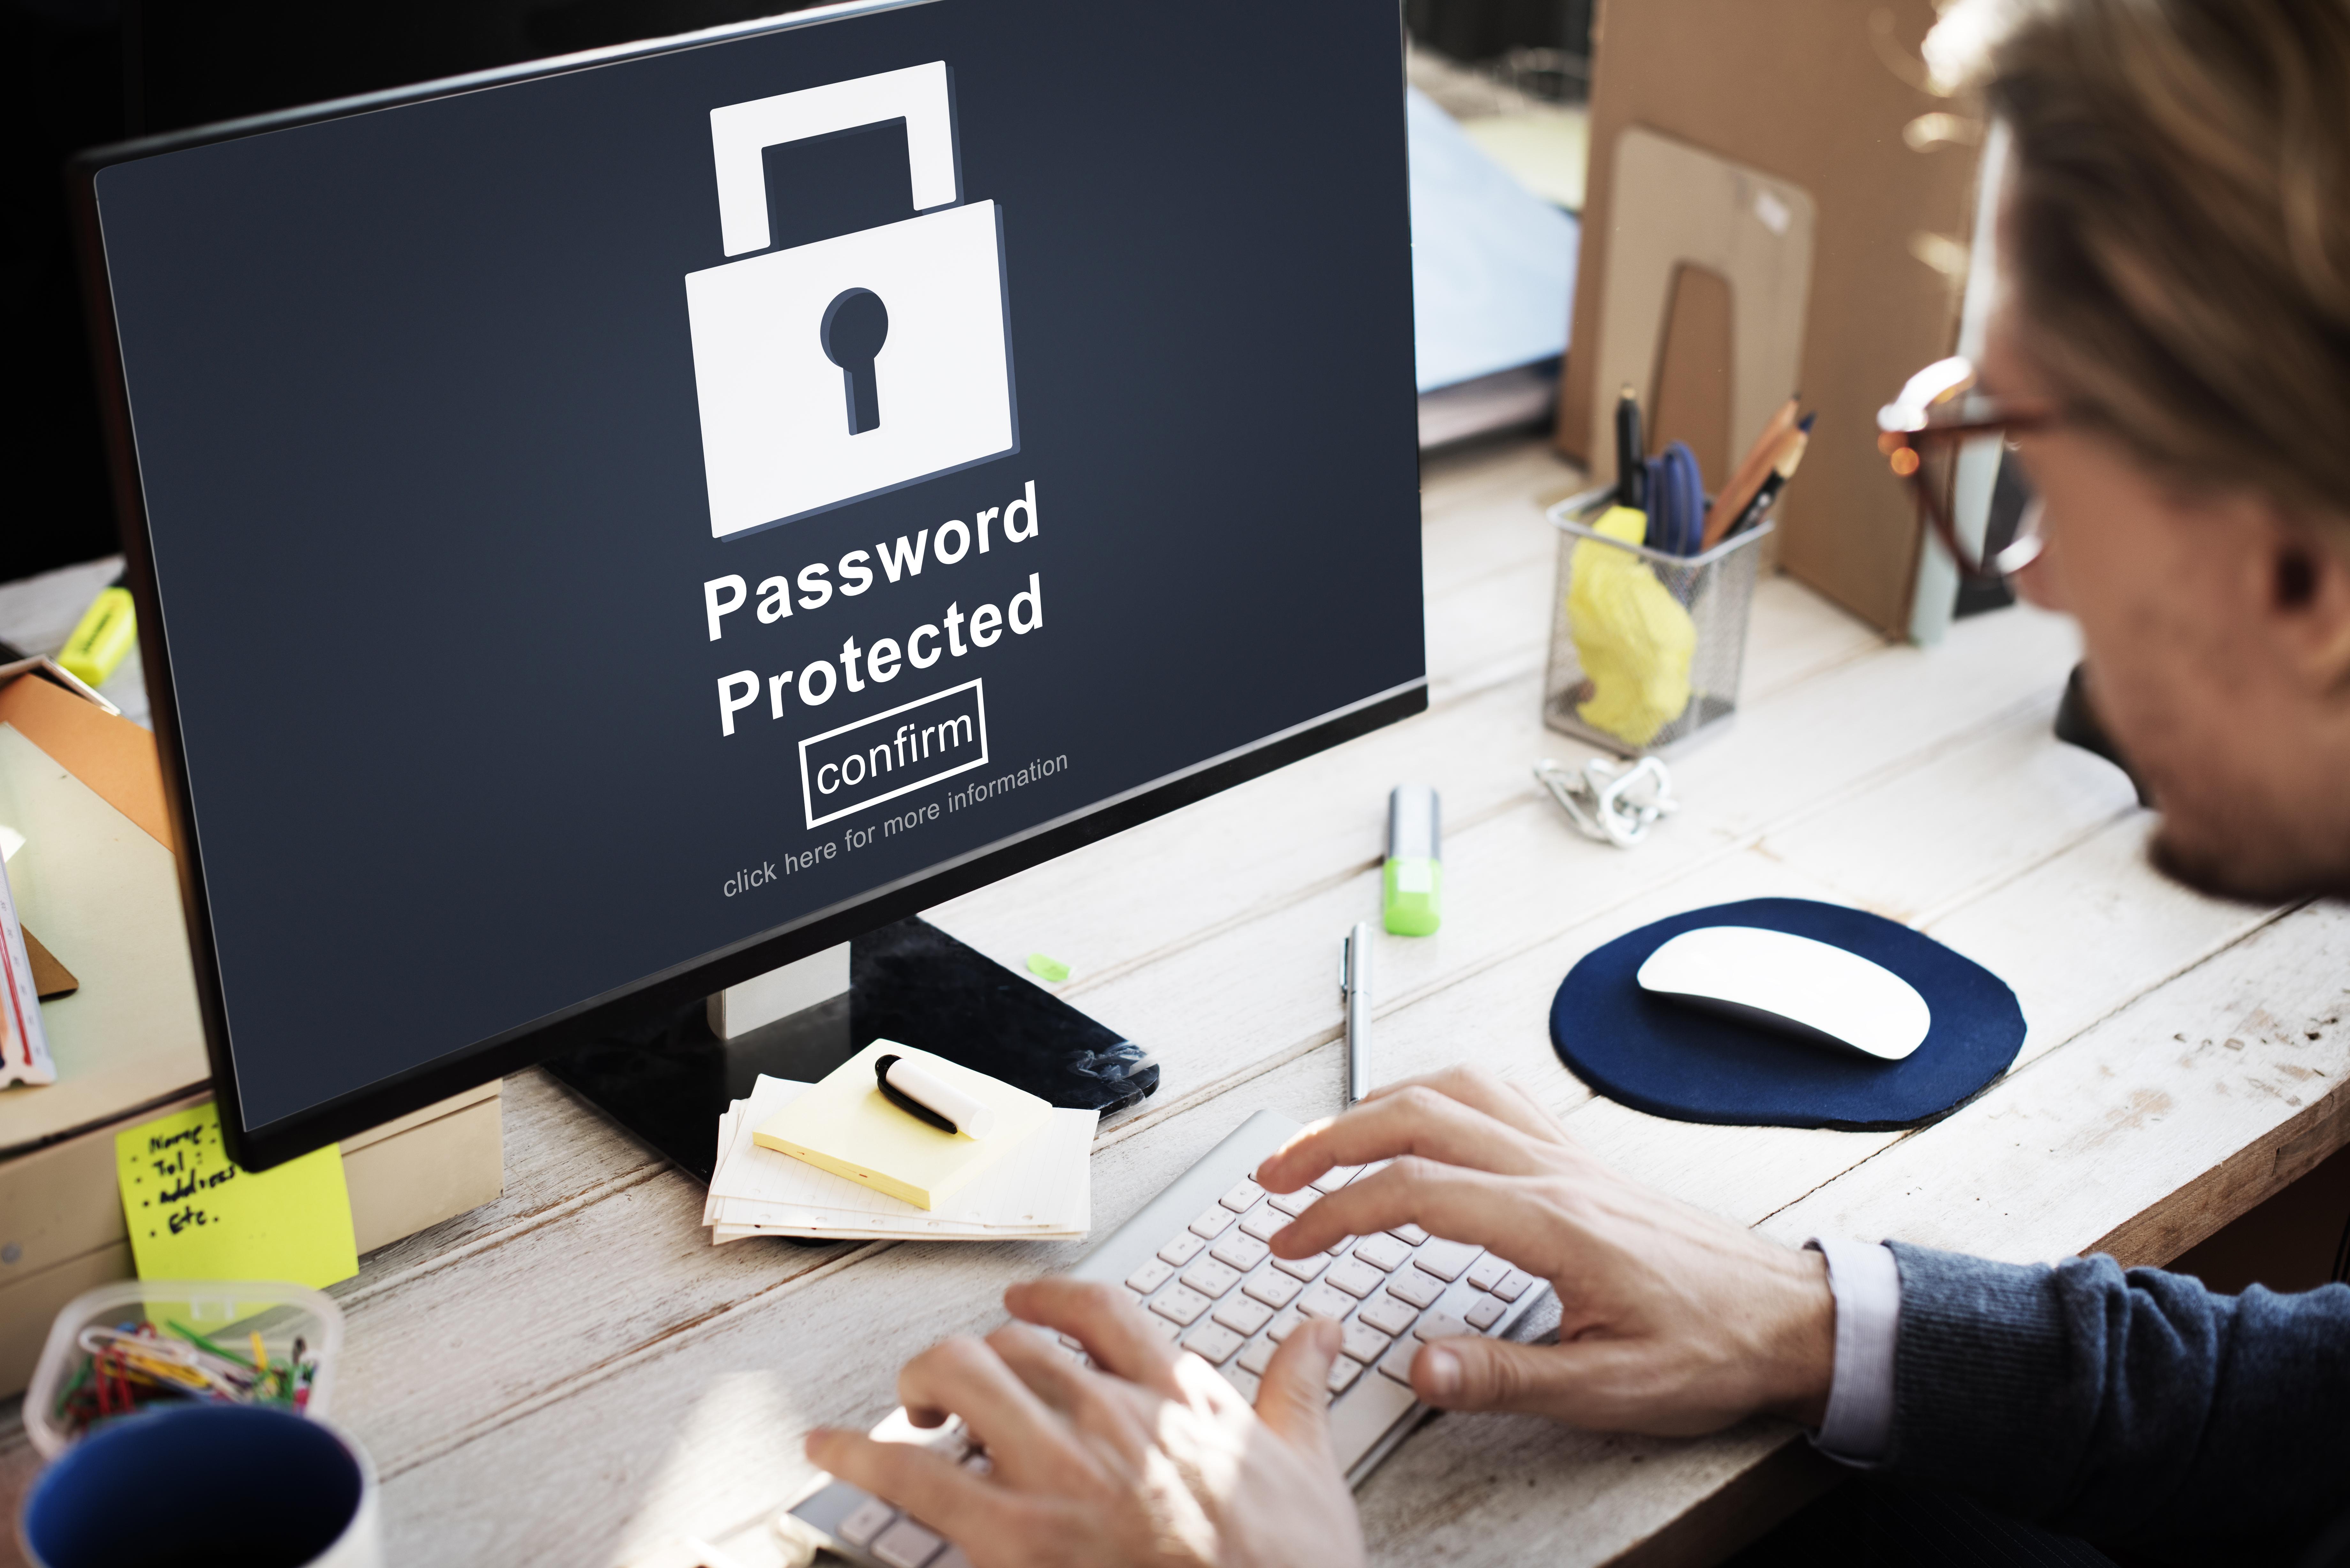 Evita los ciberataques en tu pyme